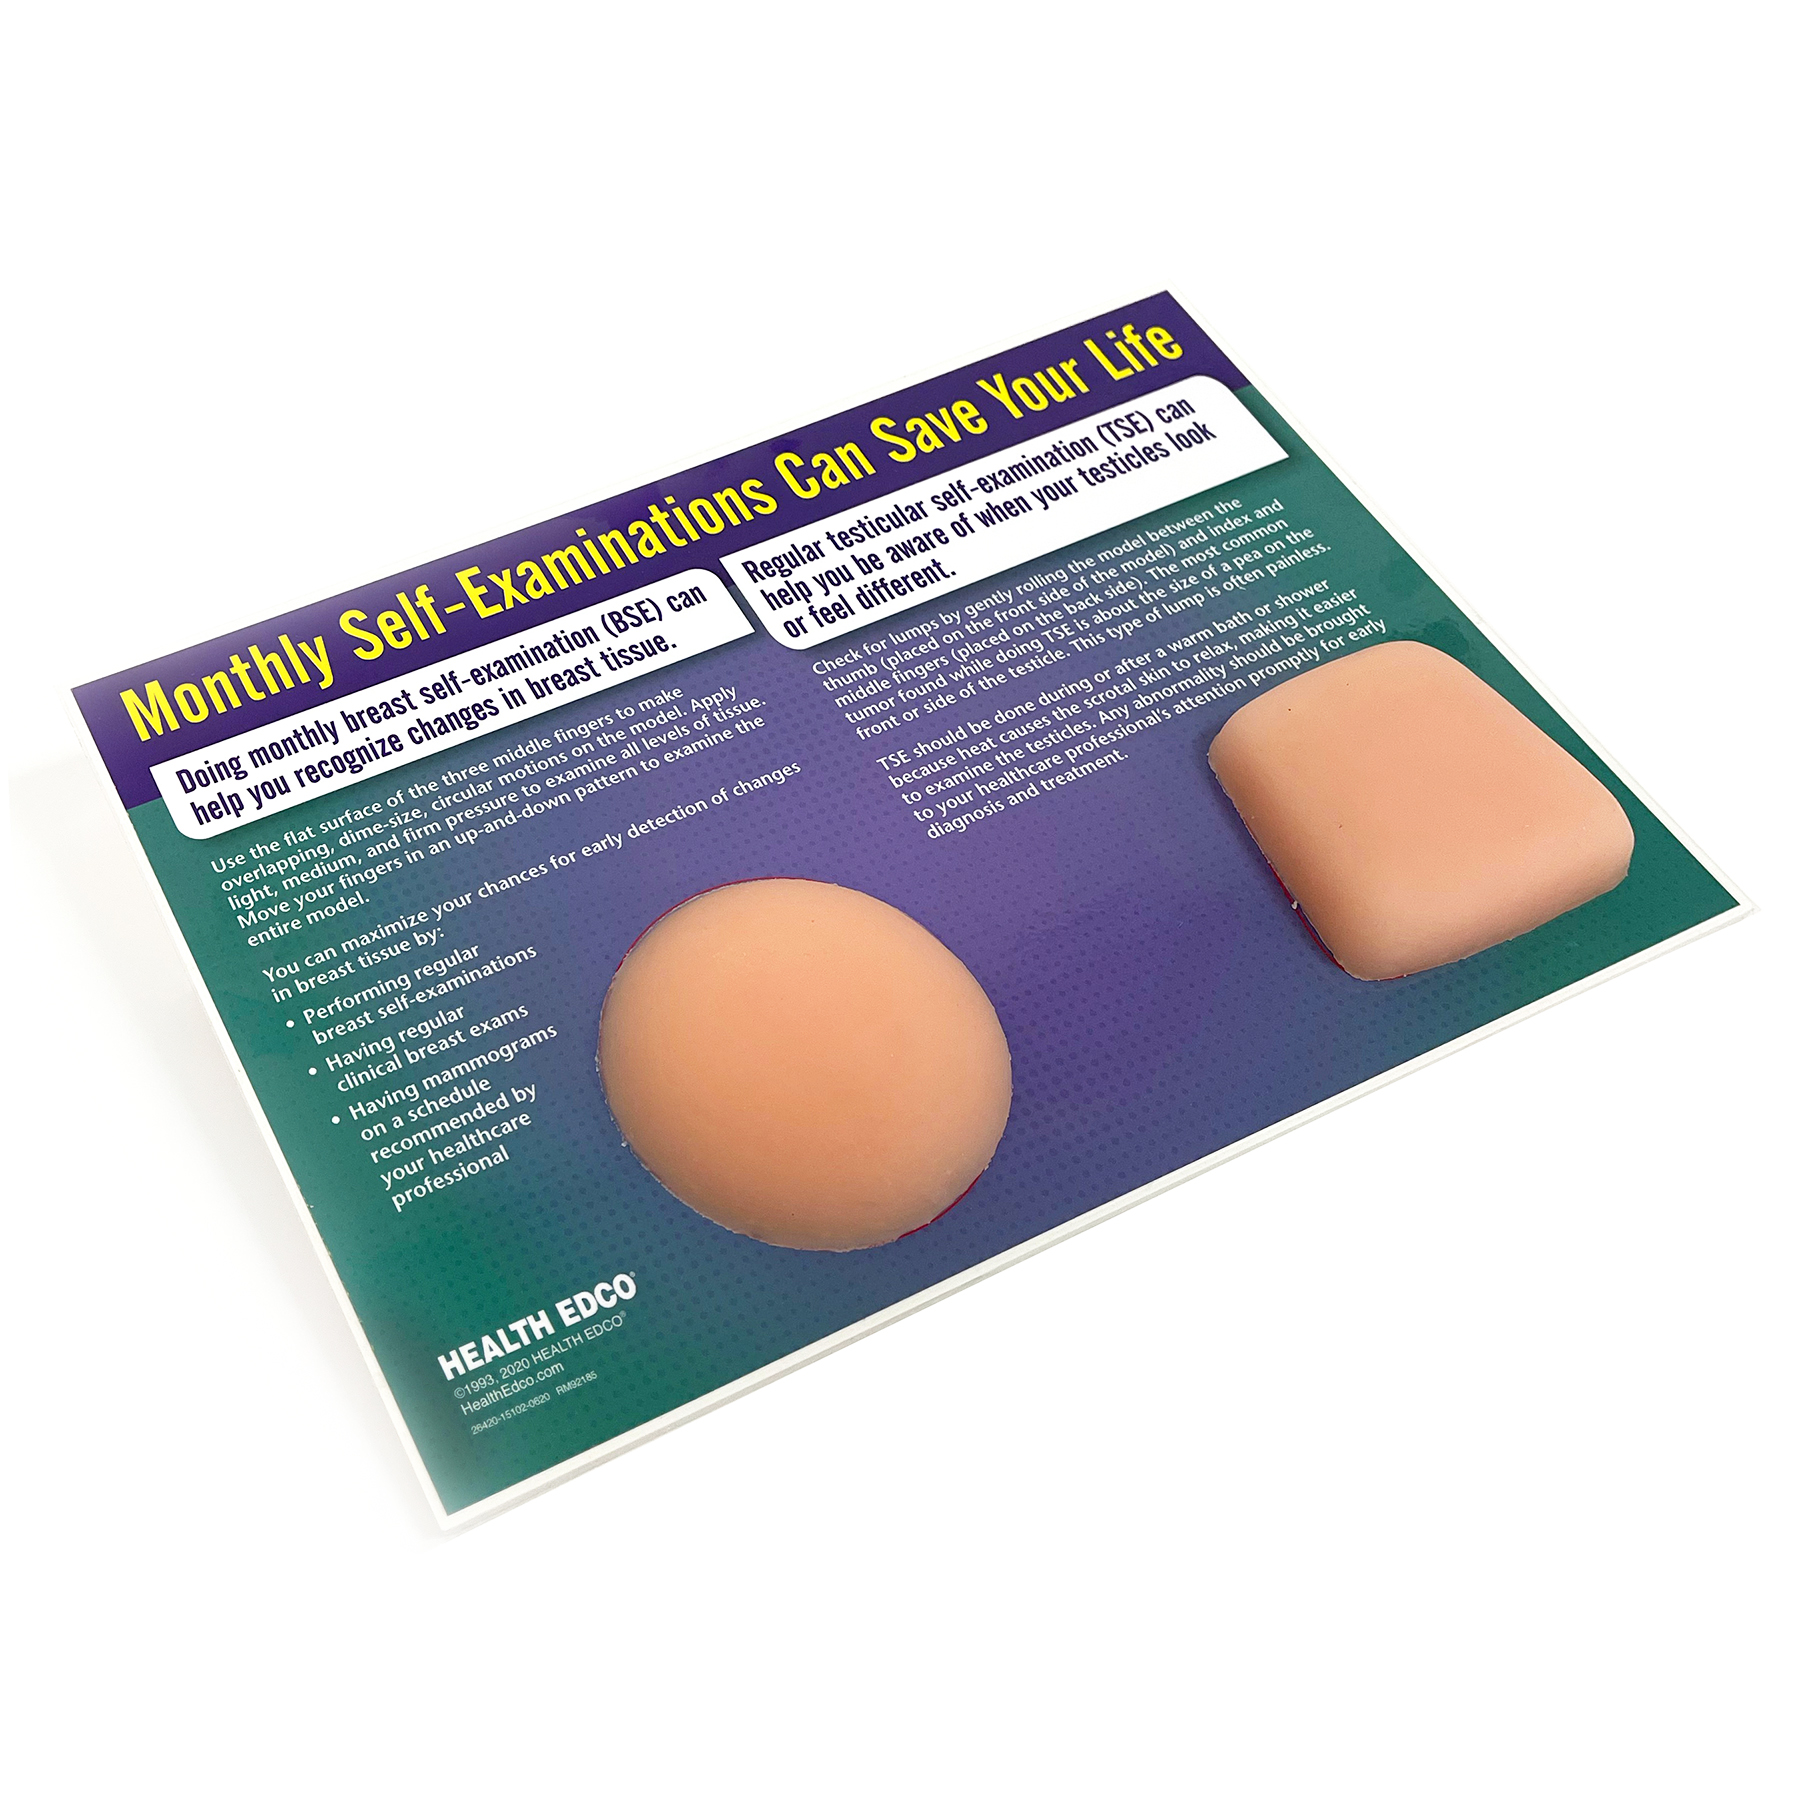 testicular self-examination, front